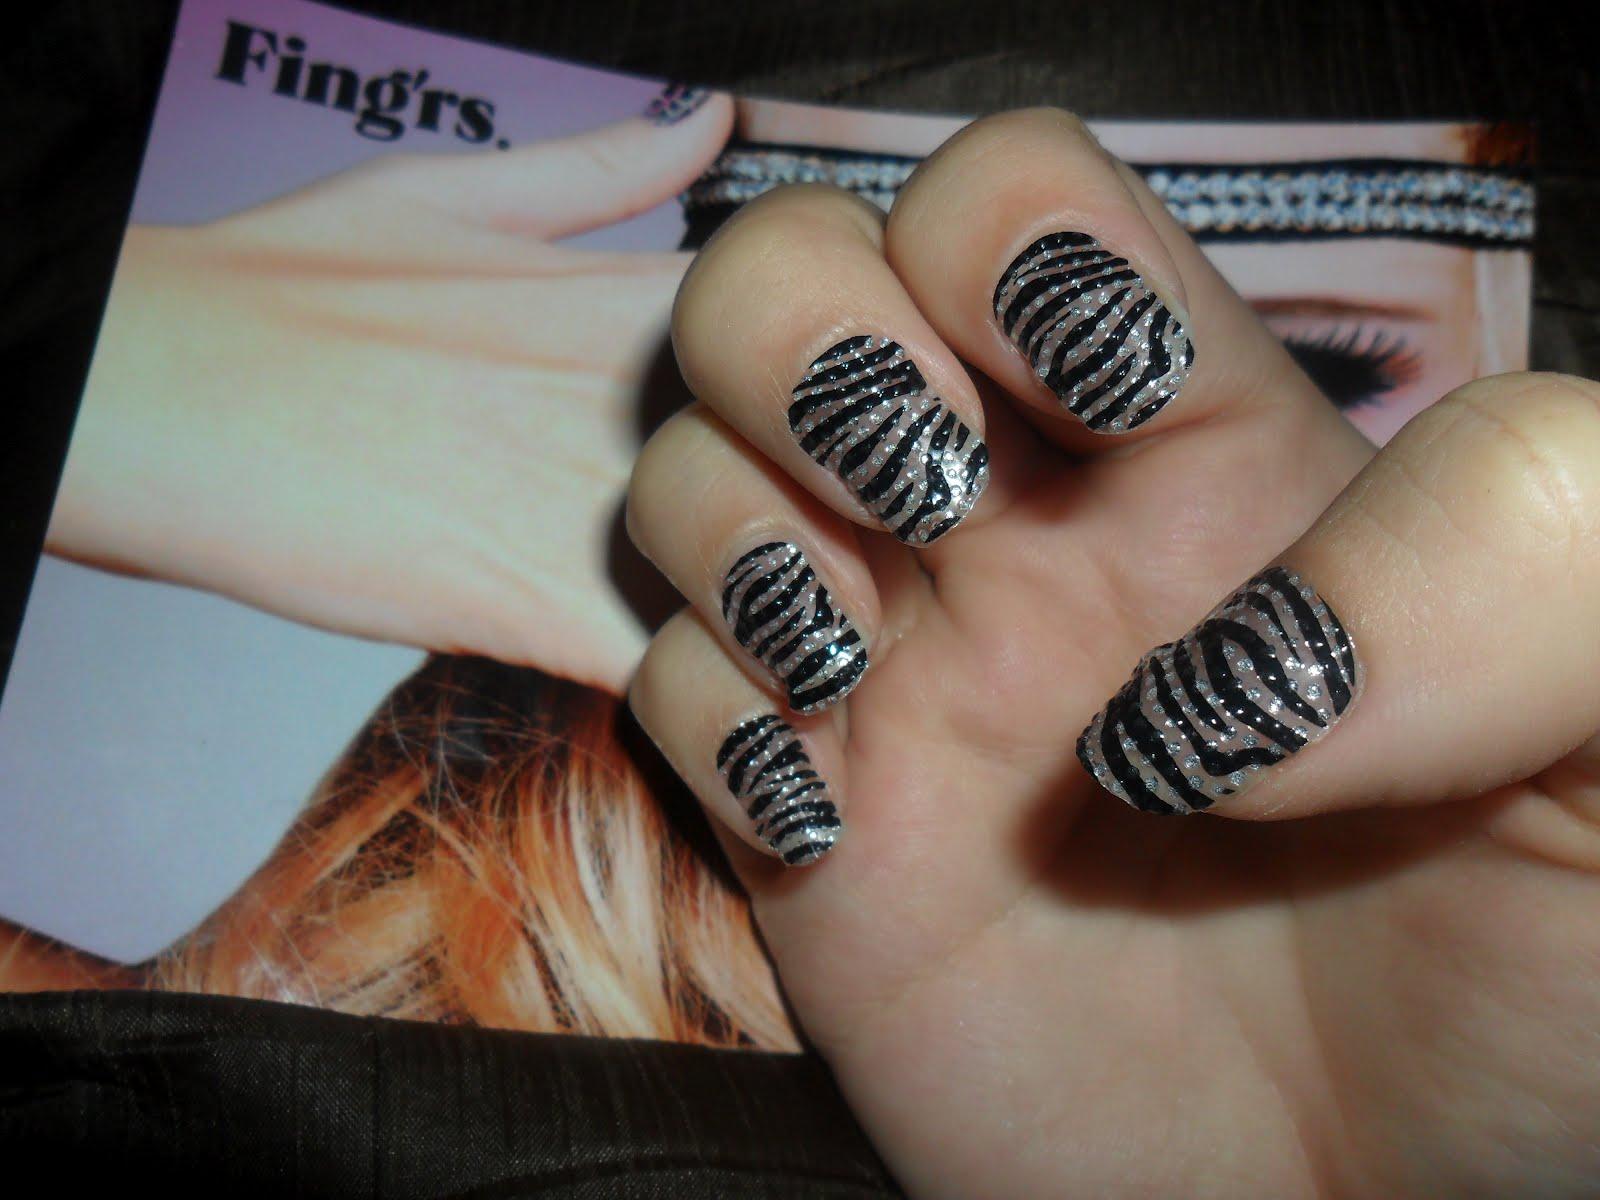 fingrs flirt nails